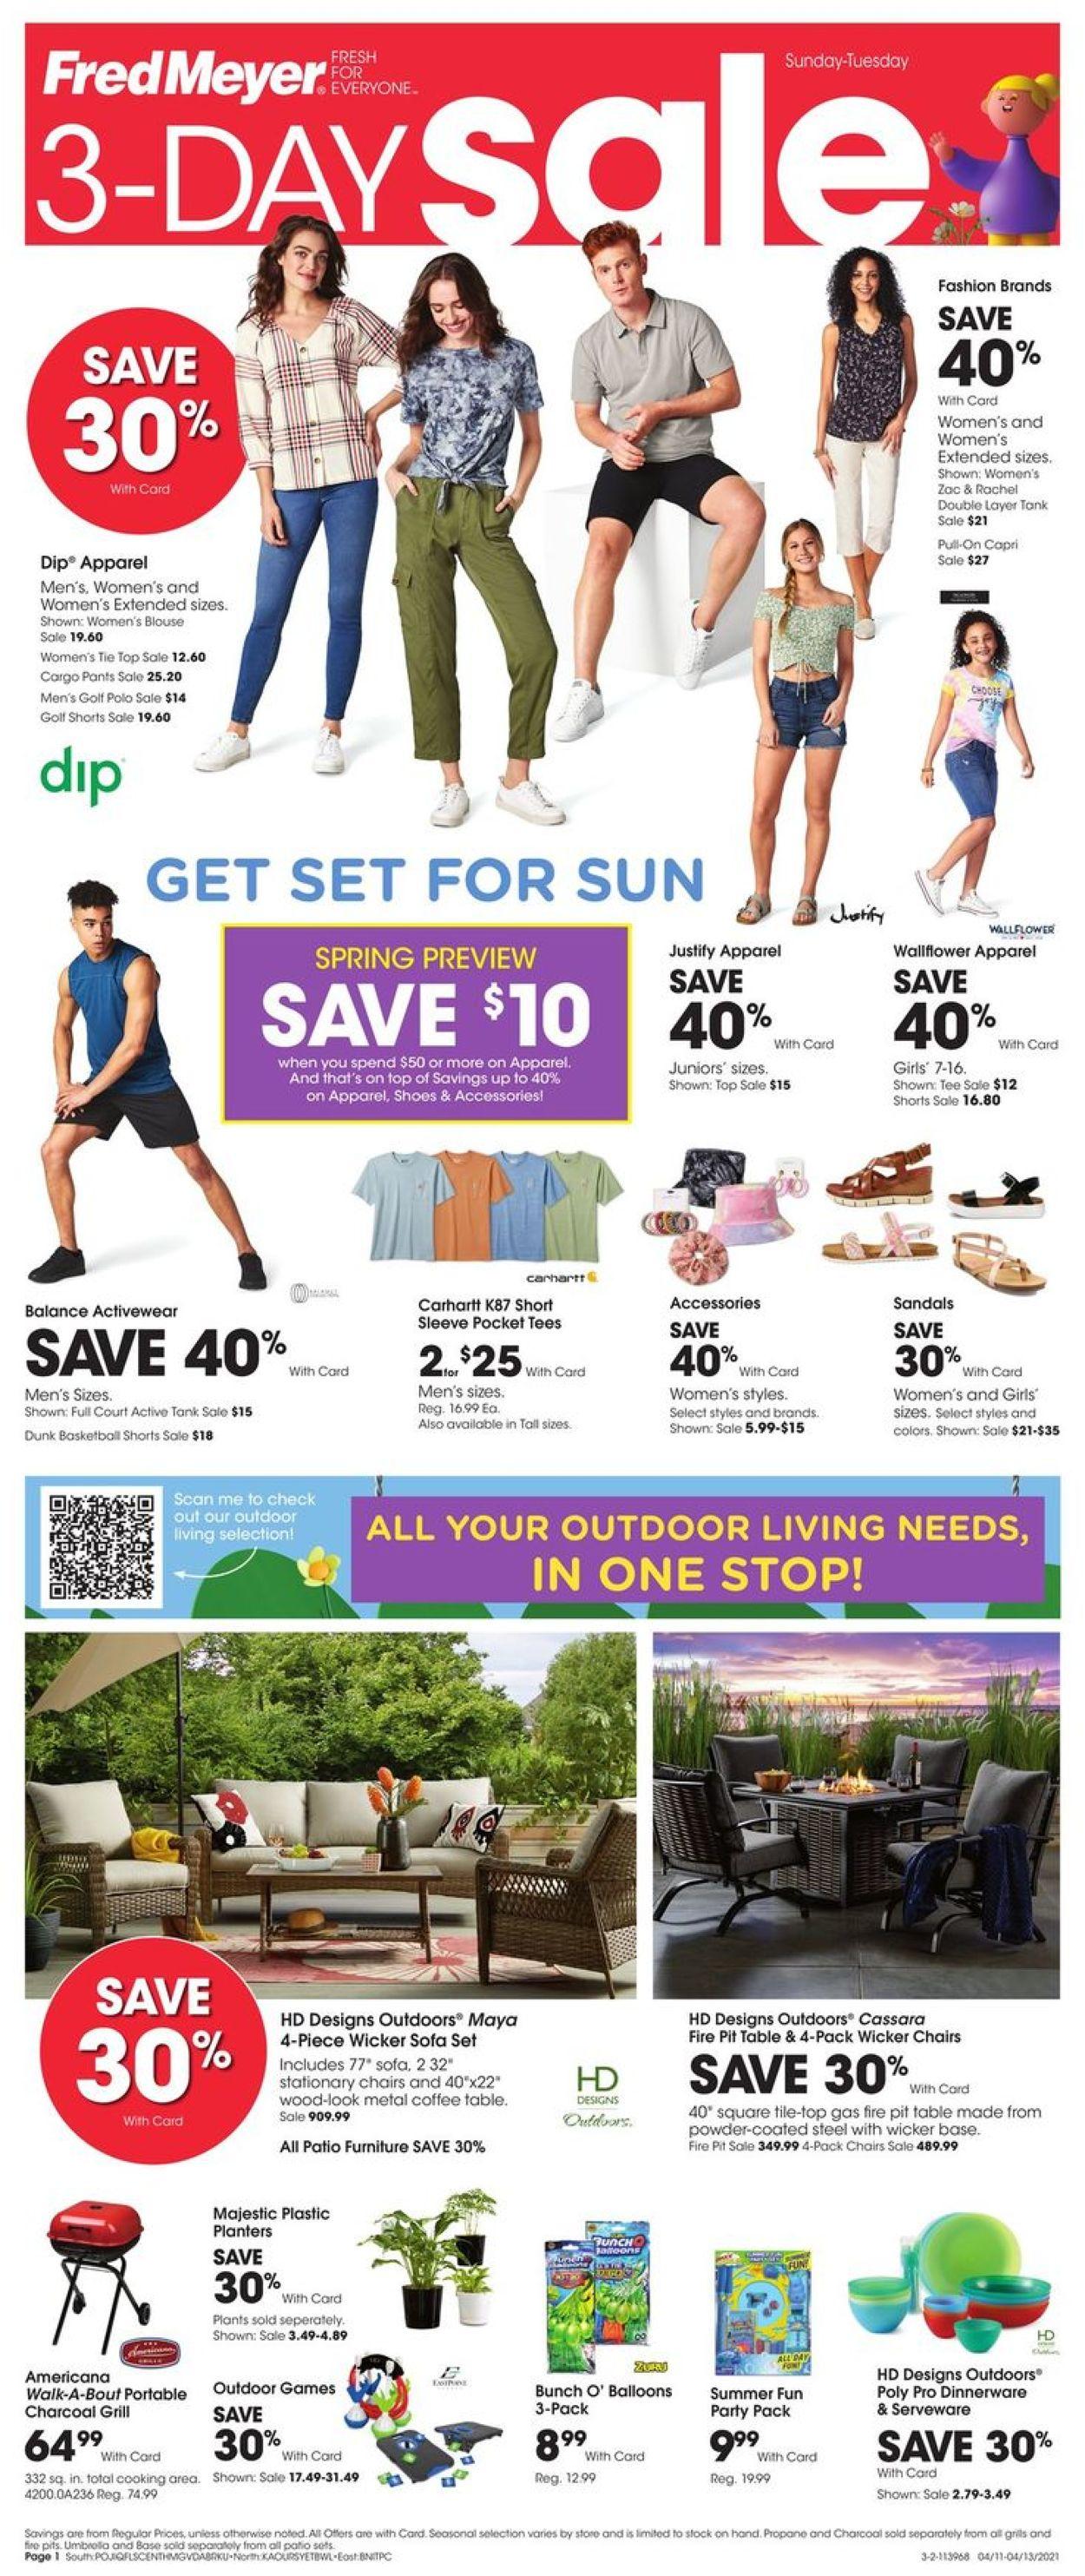 Fred Meyer Weekly Ad Circular - valid 04/11-04/13/2021